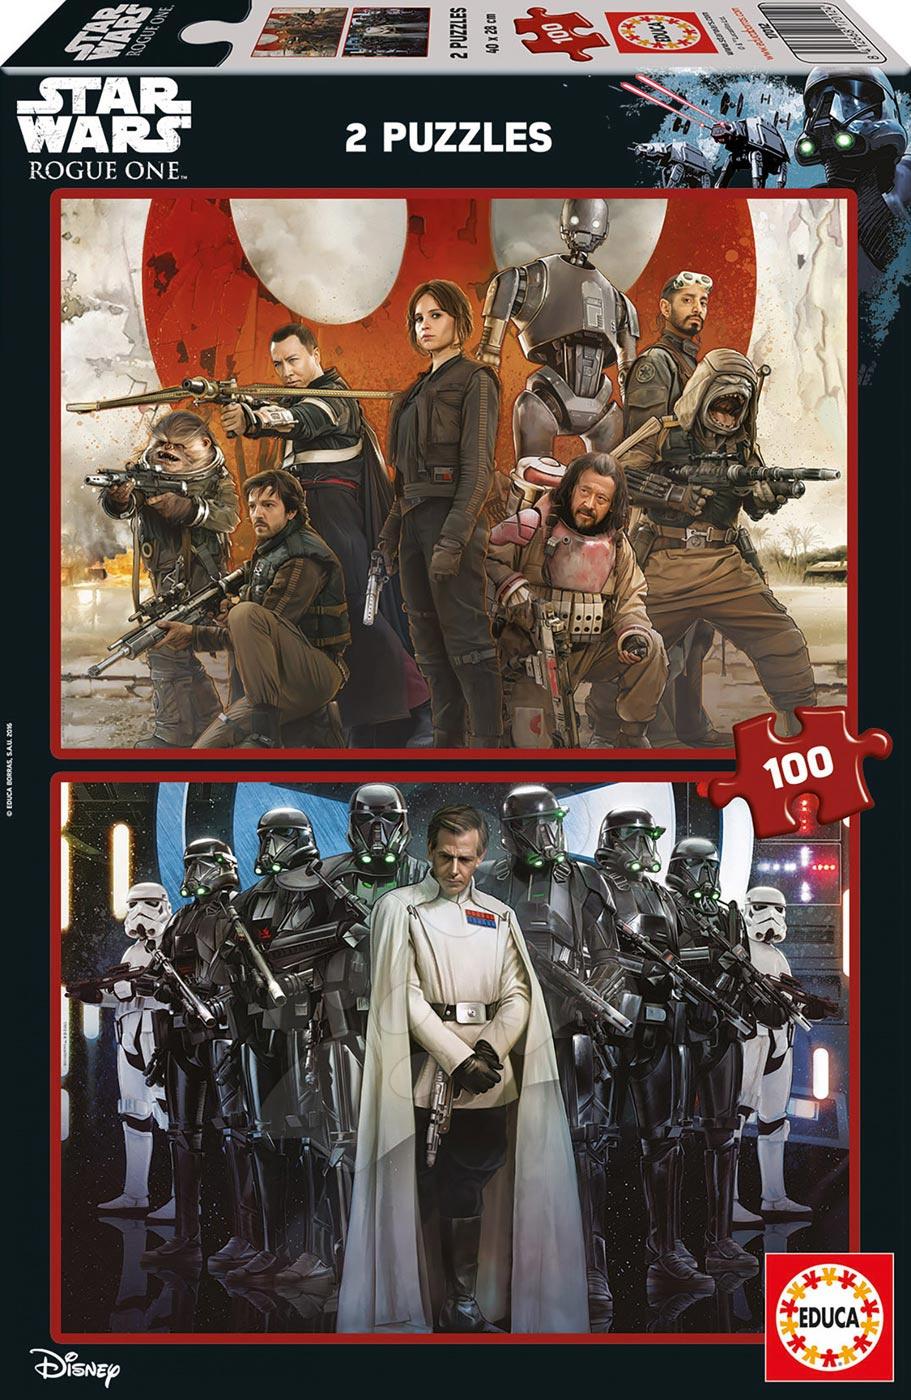 Puzzle Star Wars Story-Rouge One Educa 2x100 dílů od 5 let